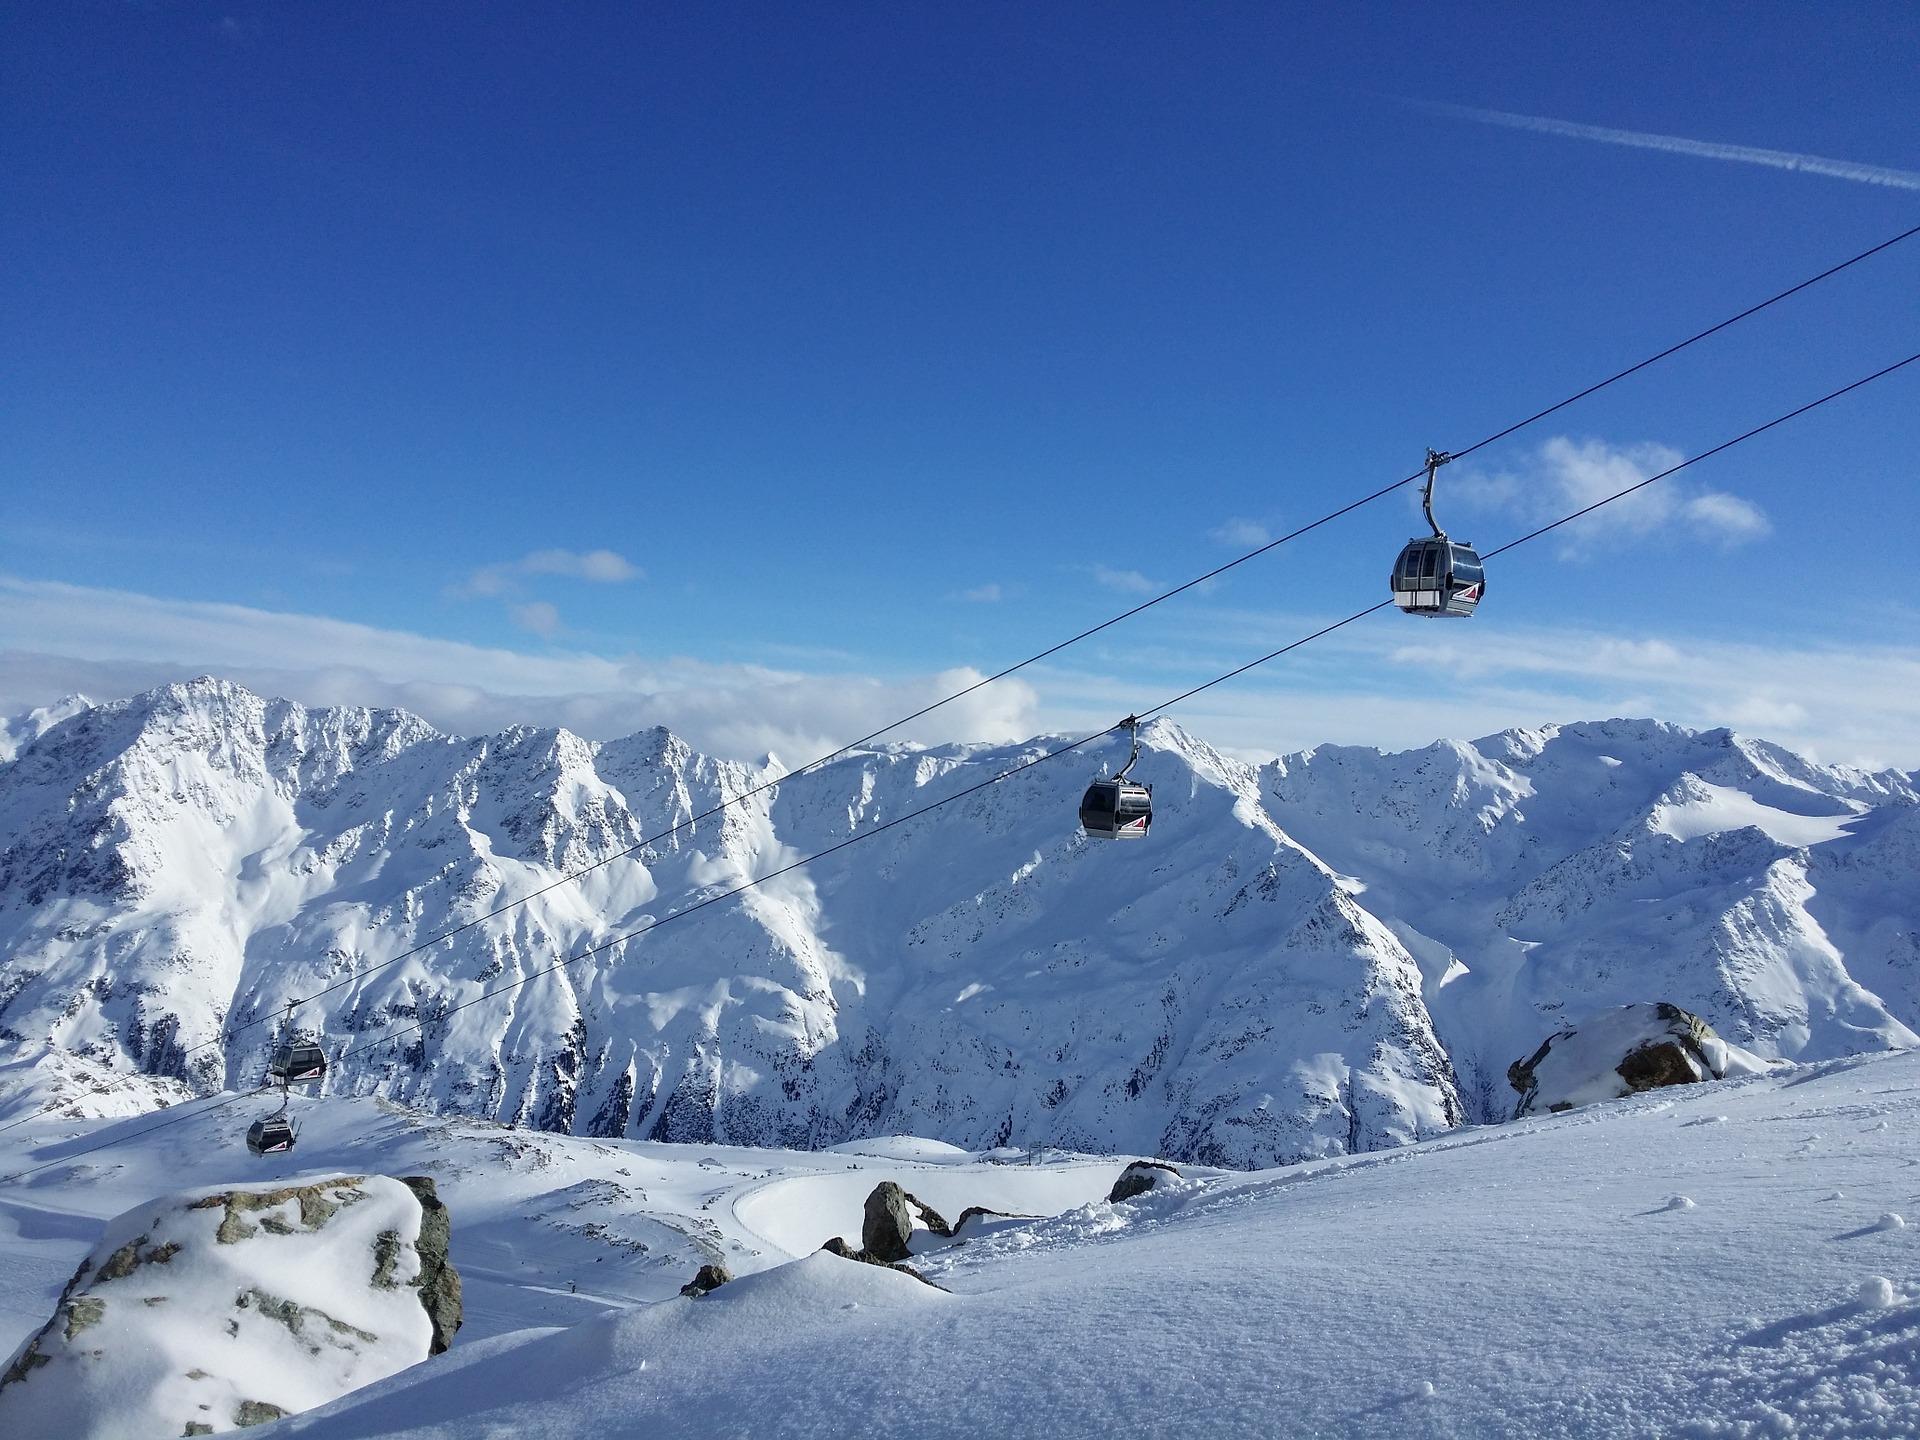 Die schönsten Langlaufloipen im Tiroler Ötztal